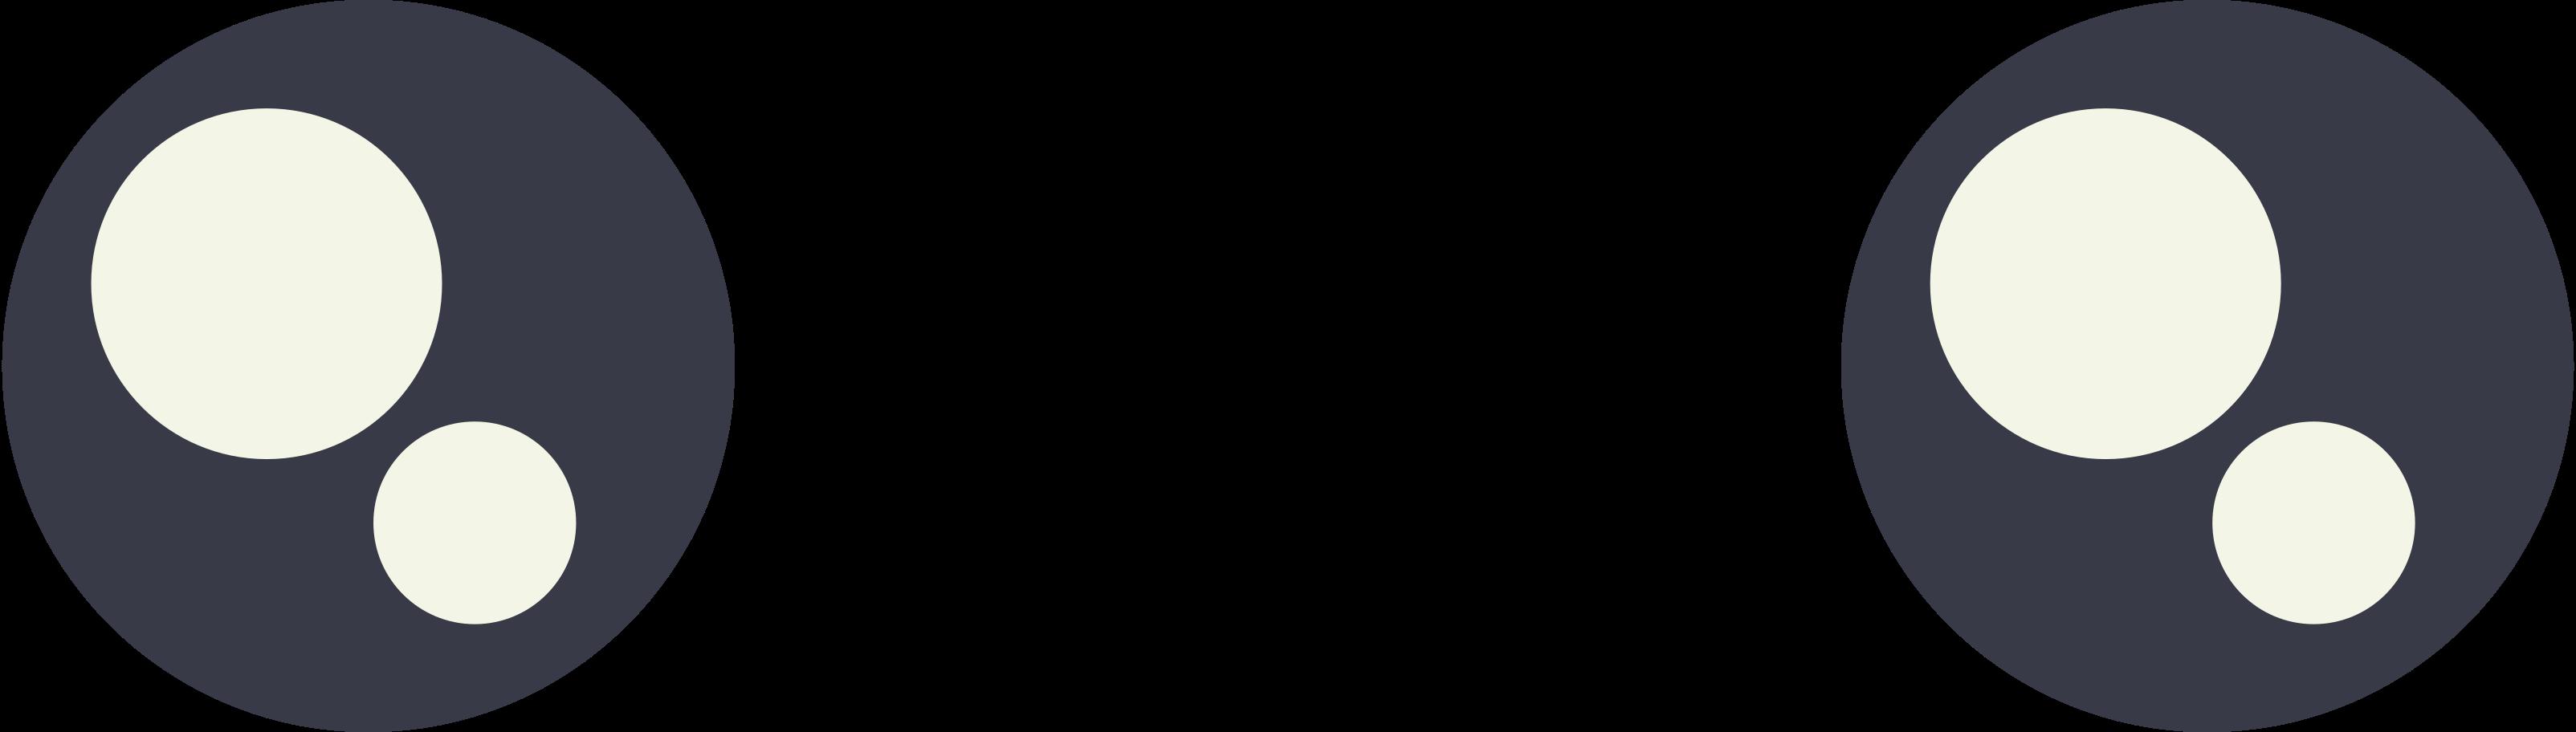 kawaii eyes Clipart illustration in PNG, SVG